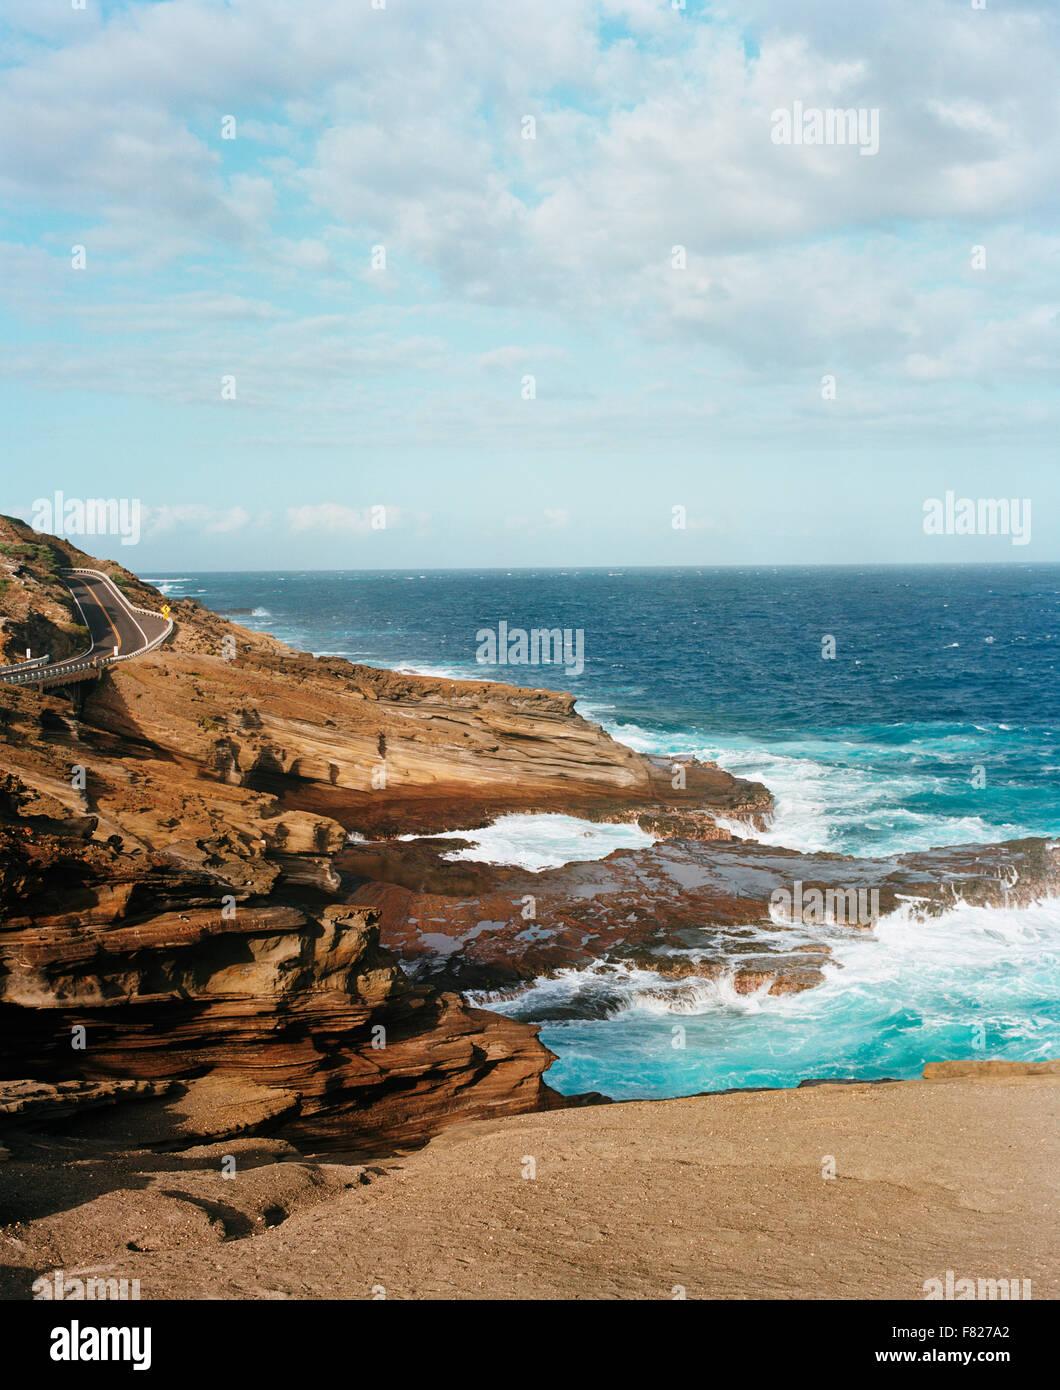 Paysage côtier à Hawaï Photo Stock